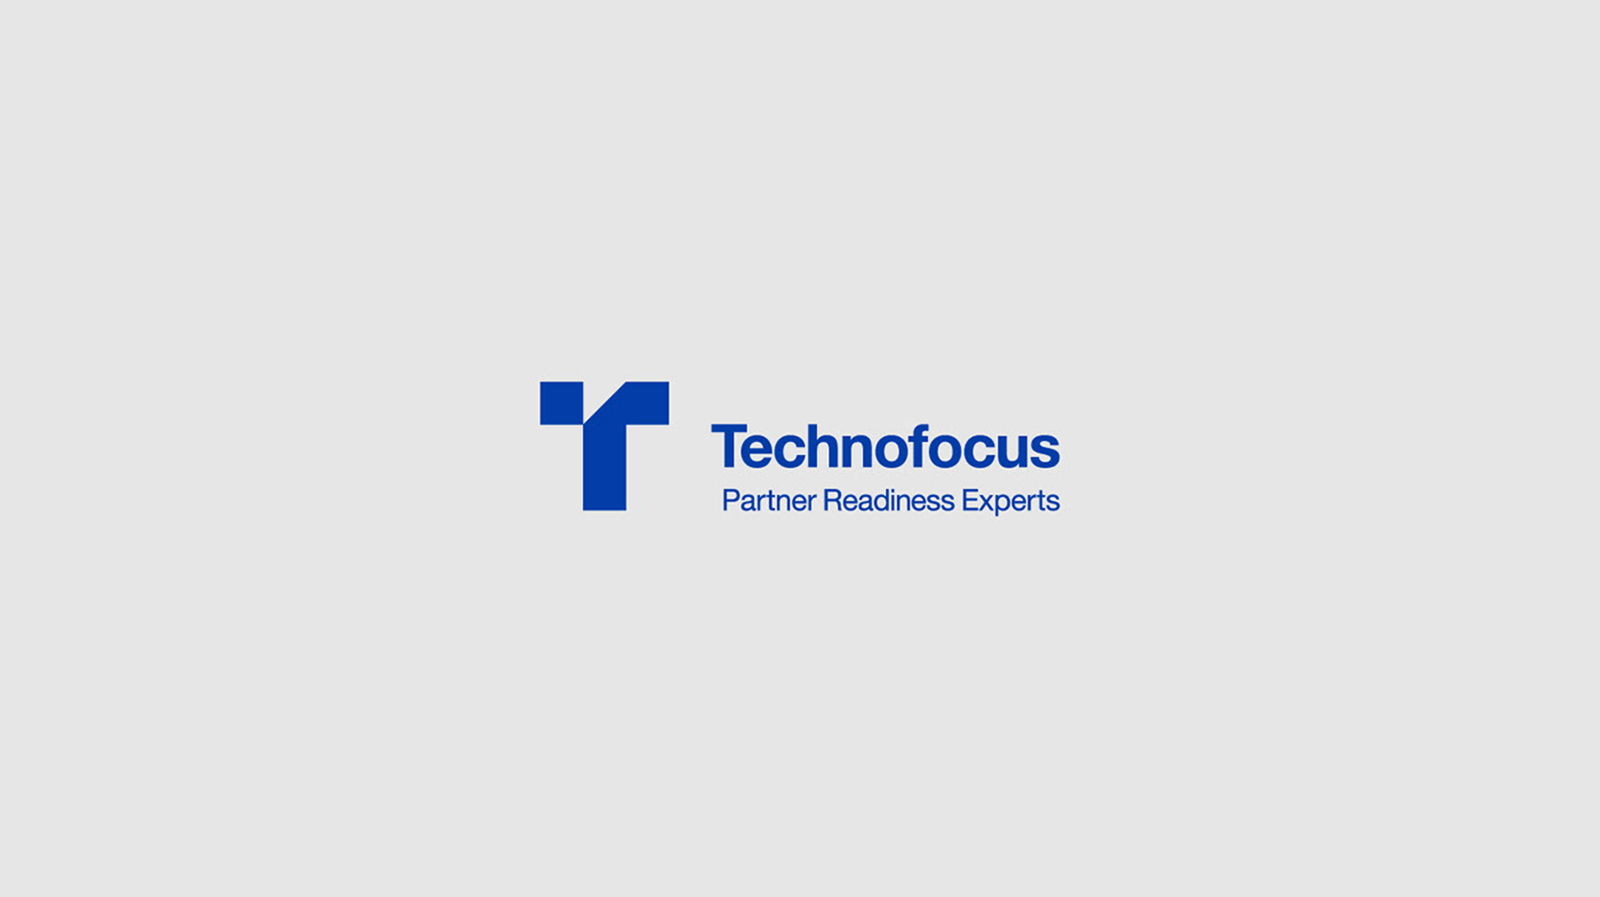 Technofocus 品牌logo形象及VI手冊設計欣賞-VI設計2